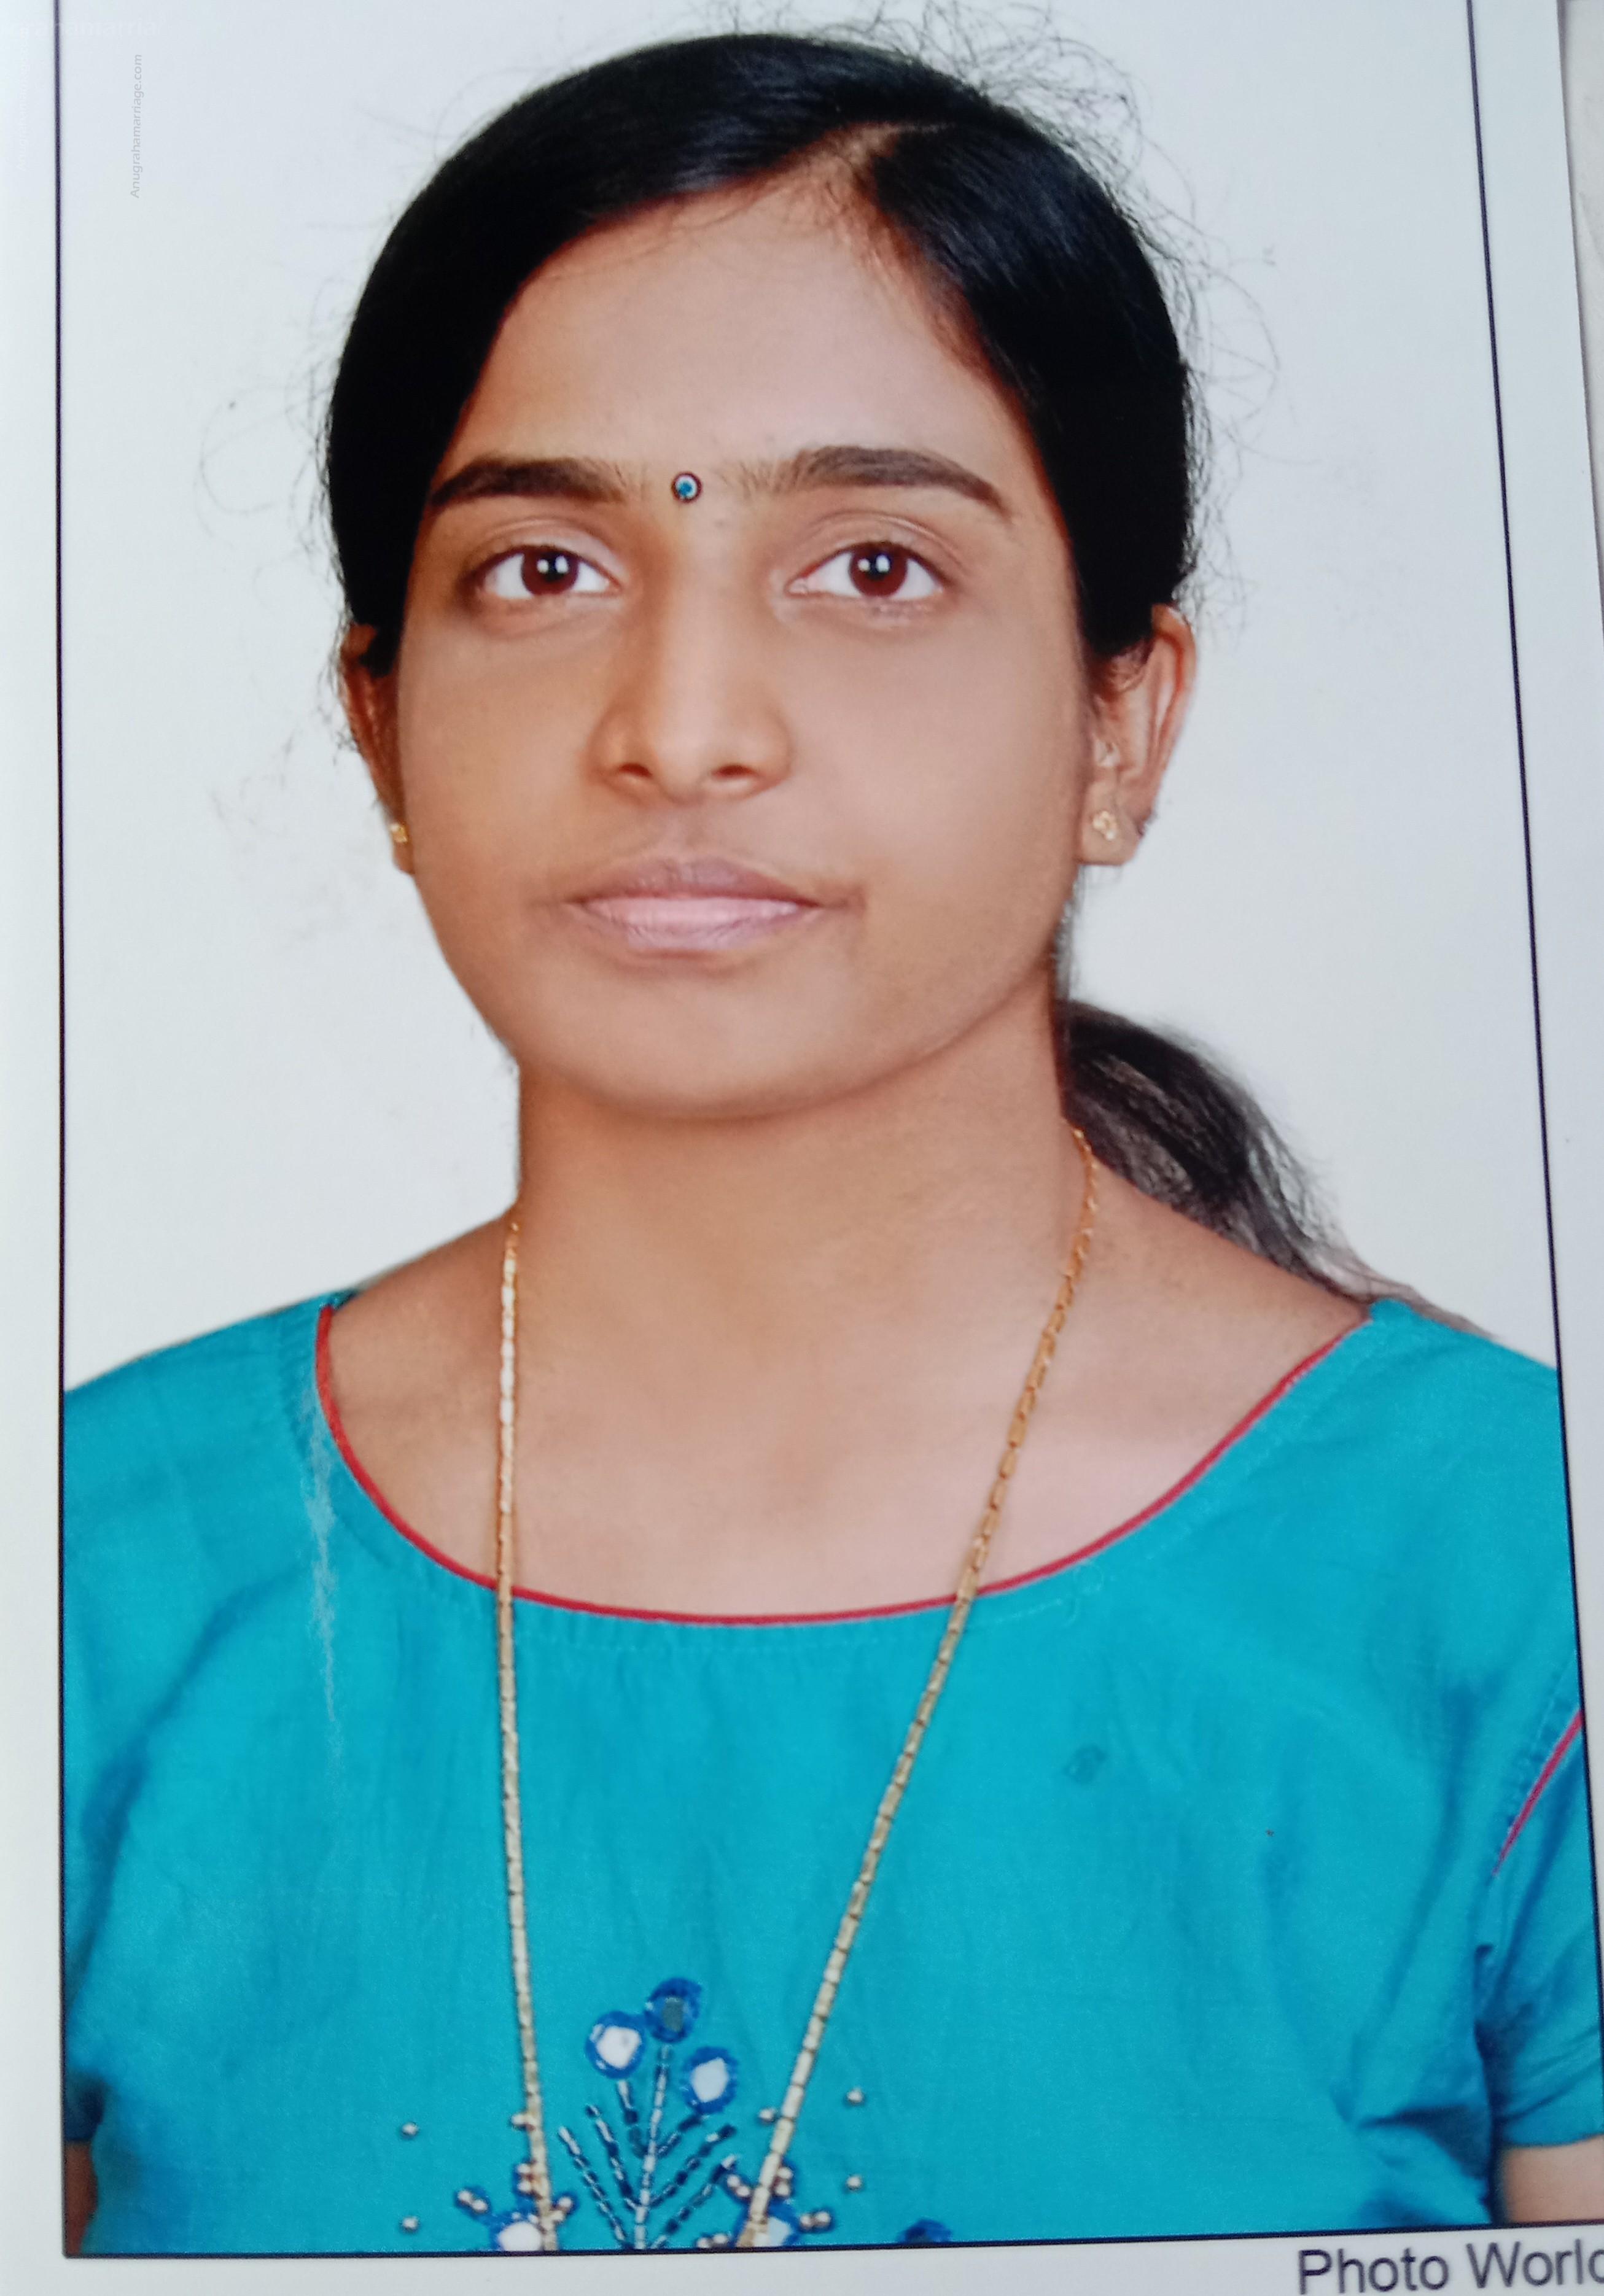 Chaithanya Baburaj- Dheevara (Pooruruttathi)